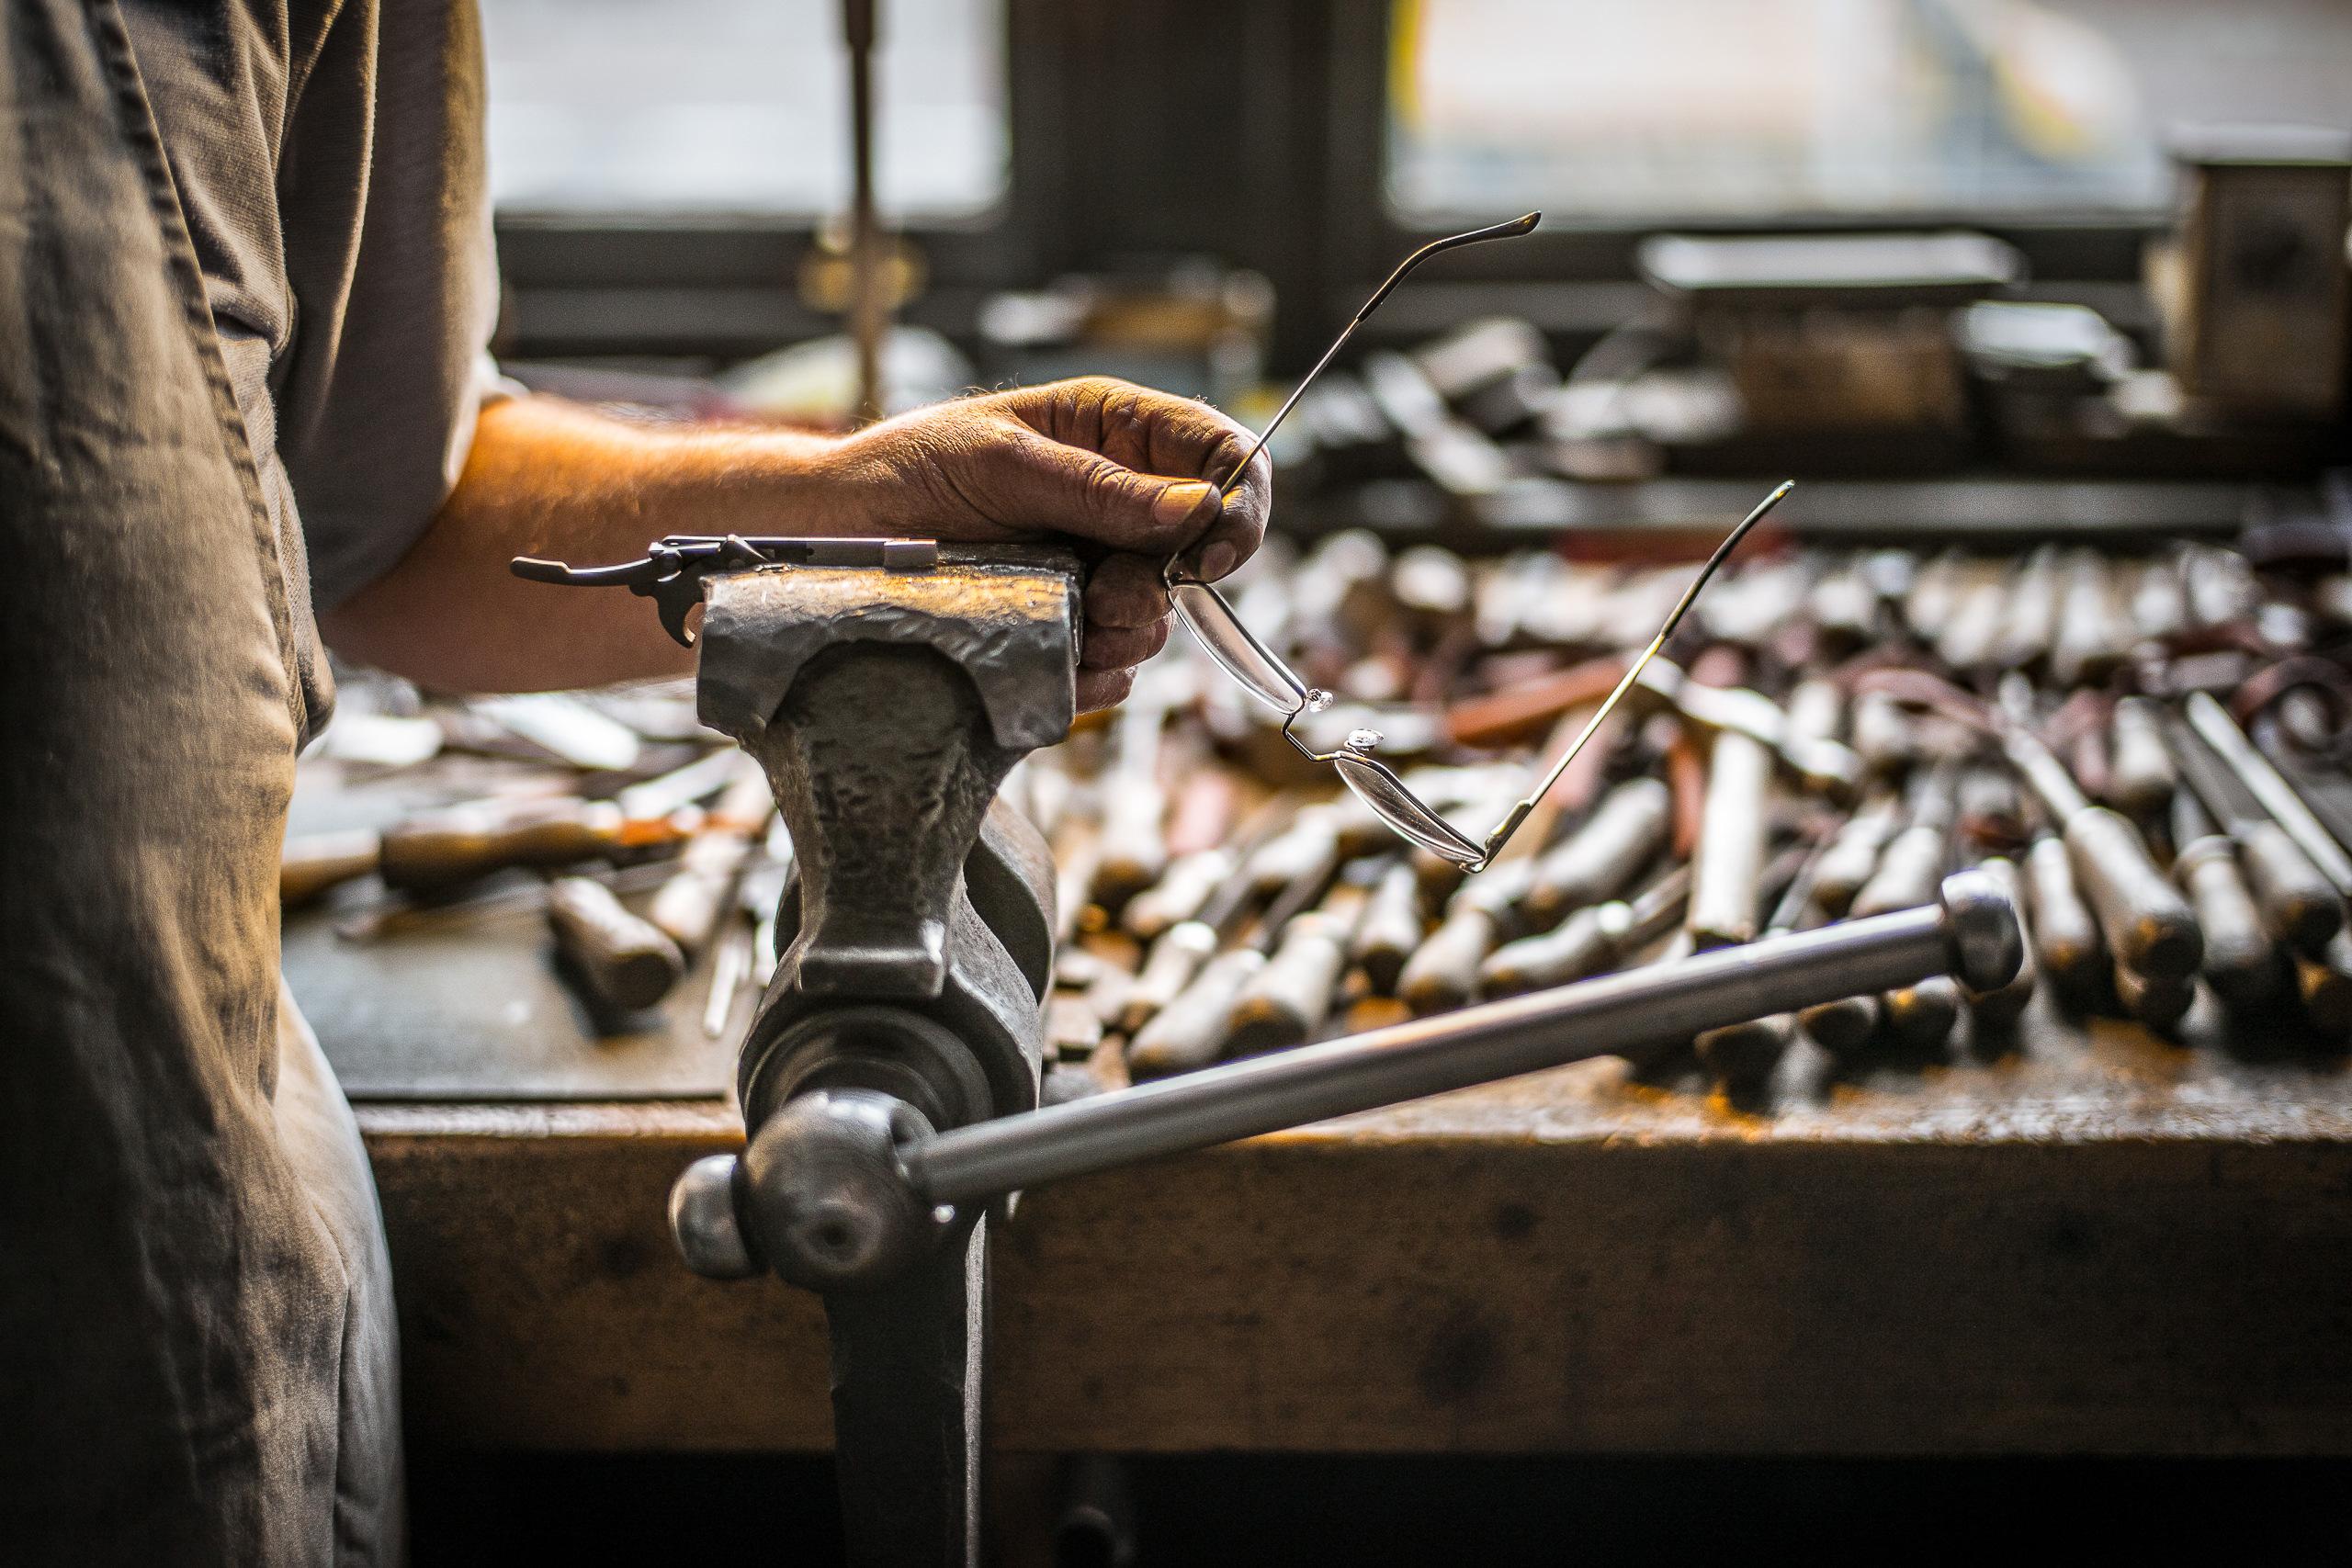 Workshop Gallery About Gun Quarter Birmingham Vice By Brett Leica Photographer